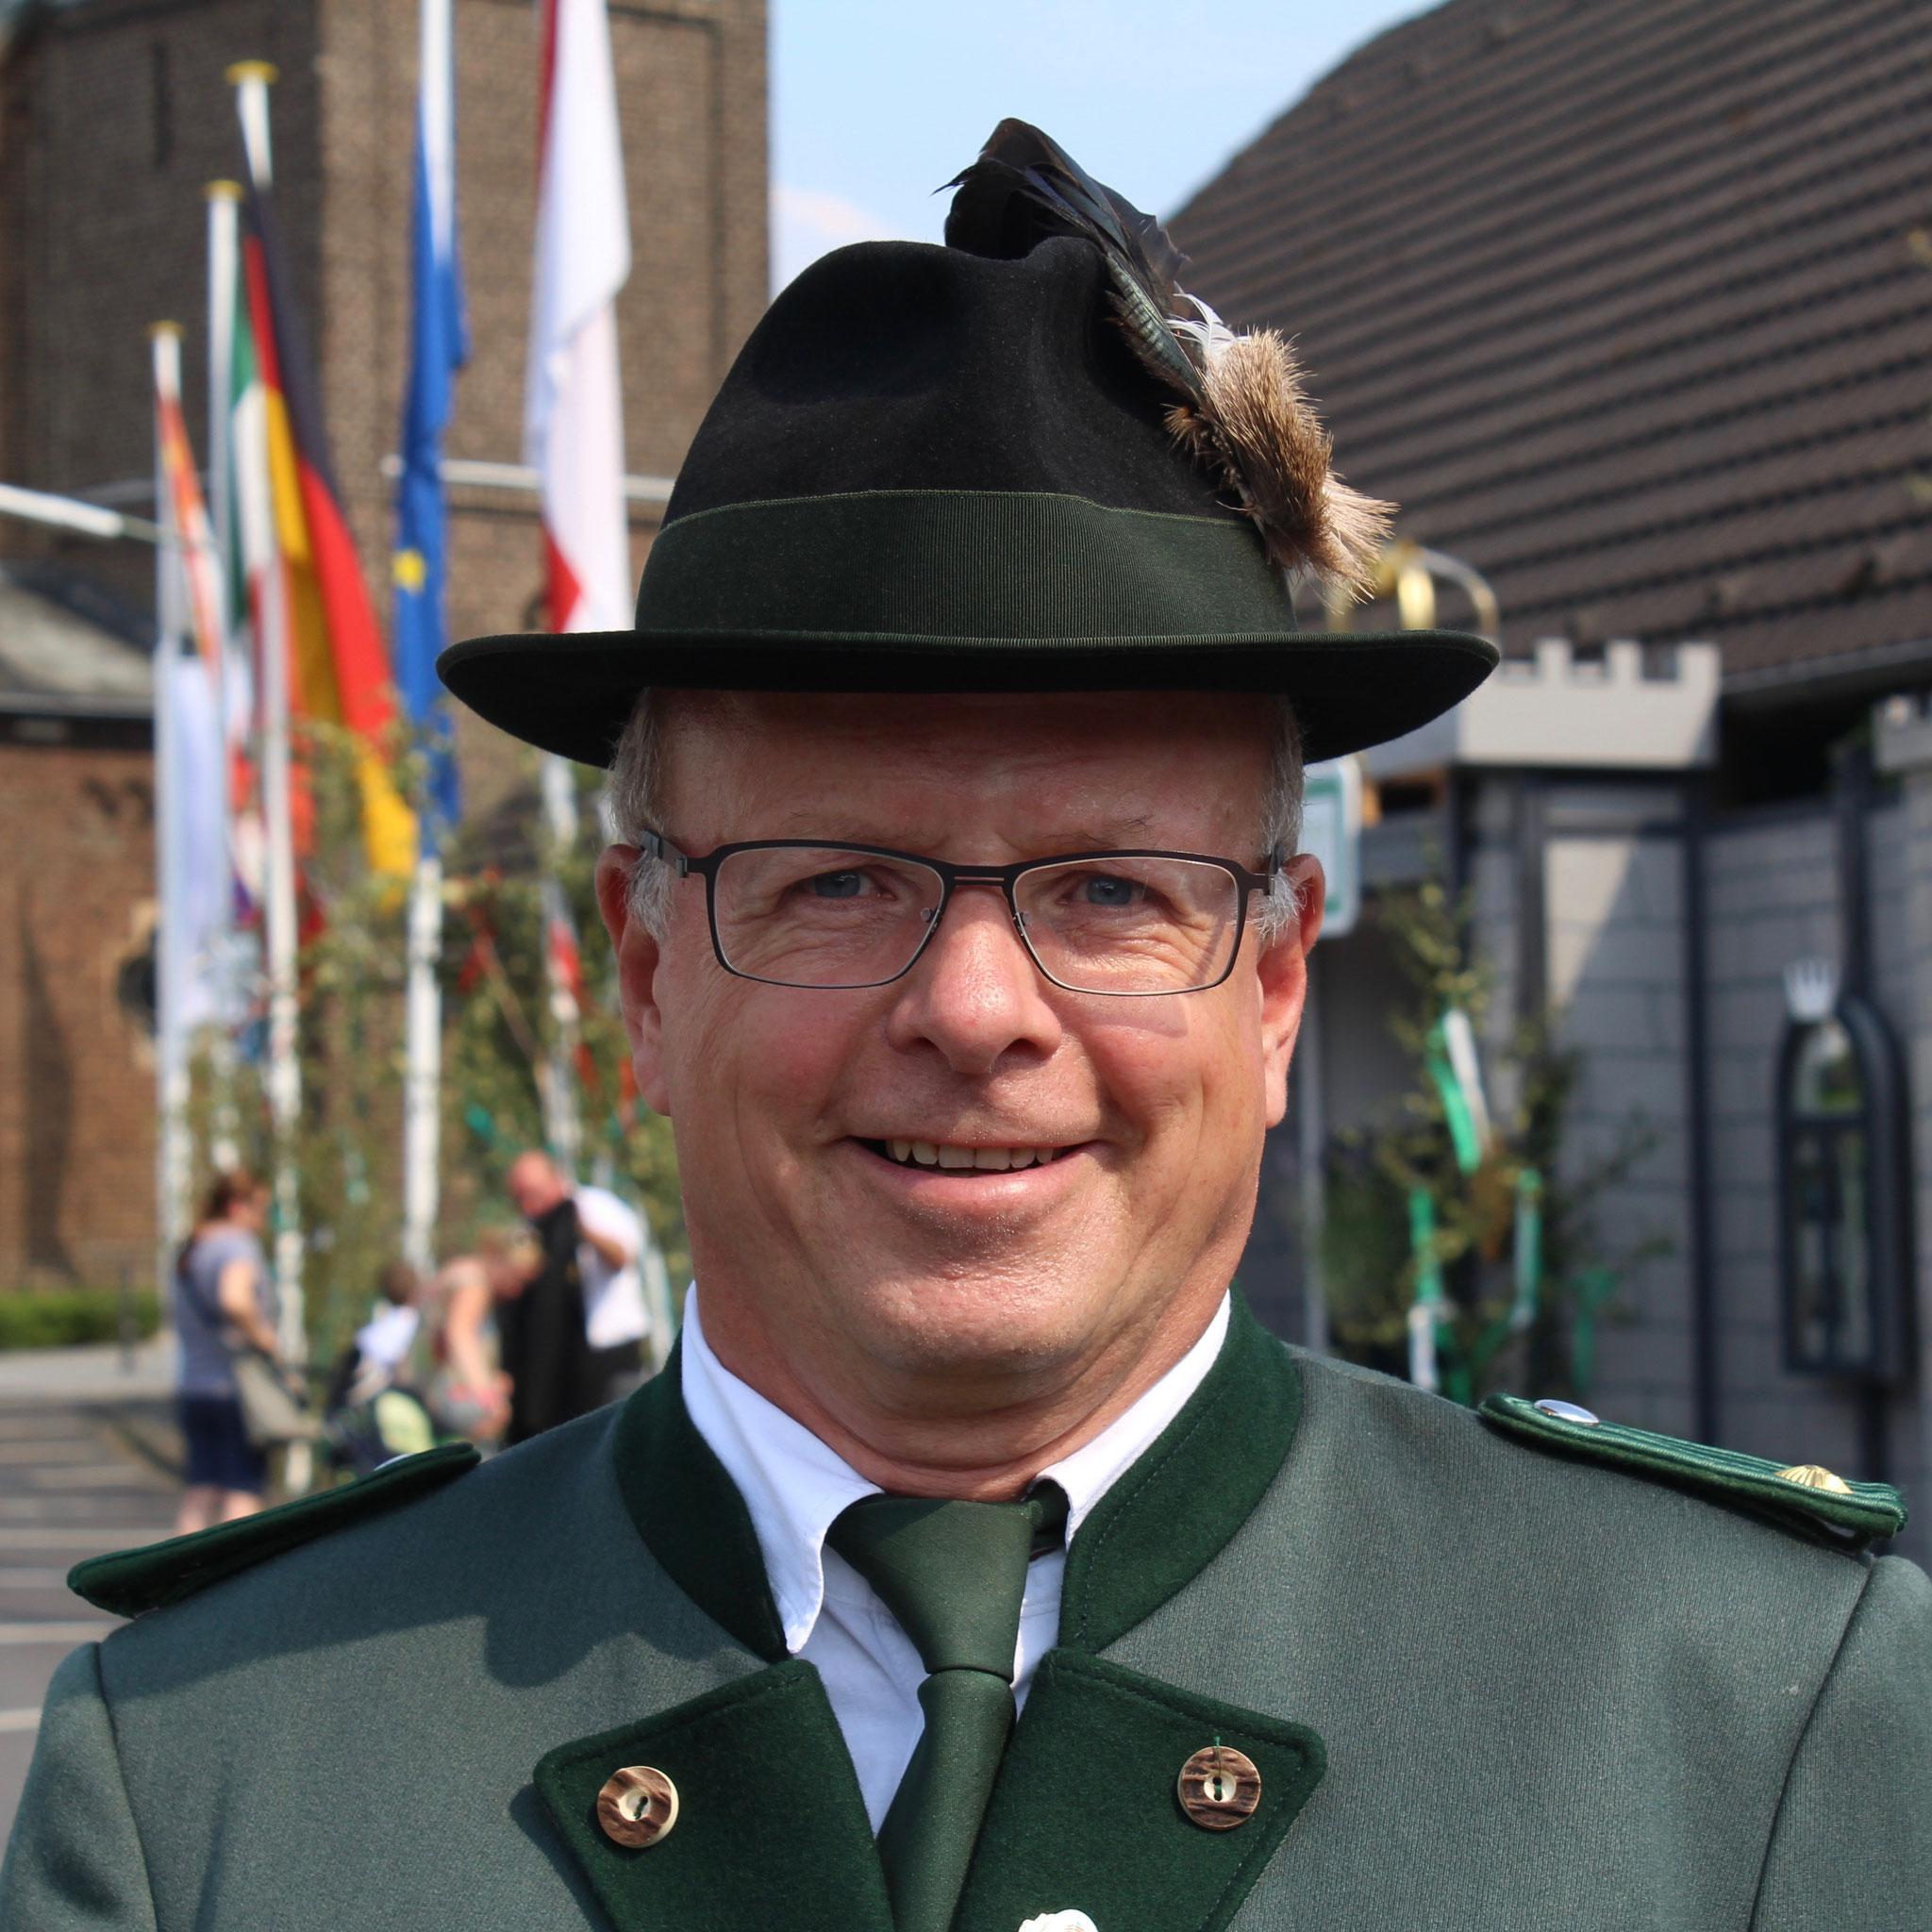 Rolf Engelmann